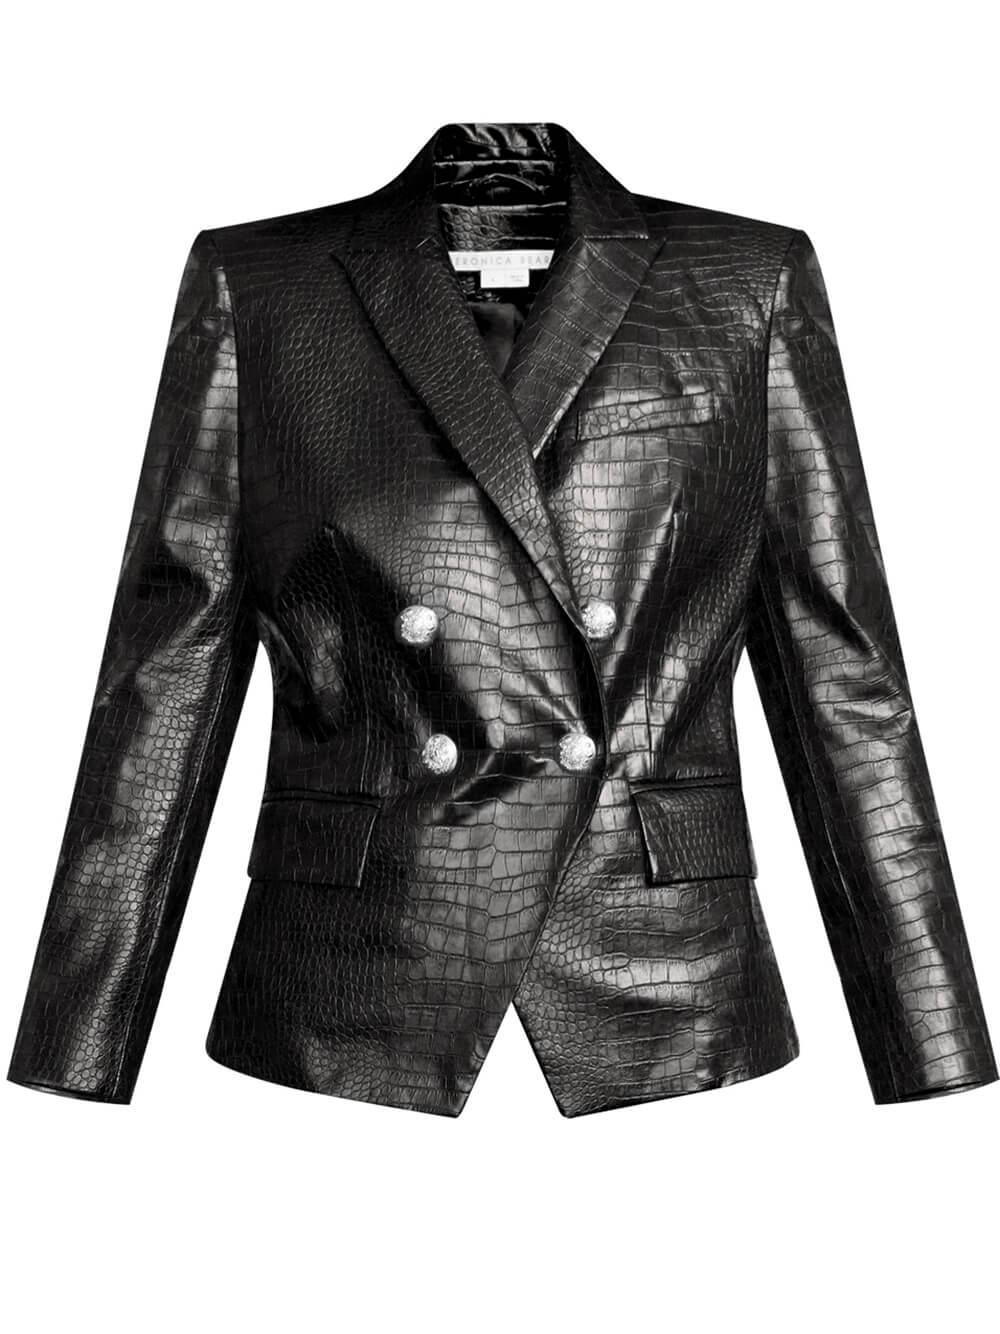 Gail Vegan Leather Jacket Item # 2108LT121676